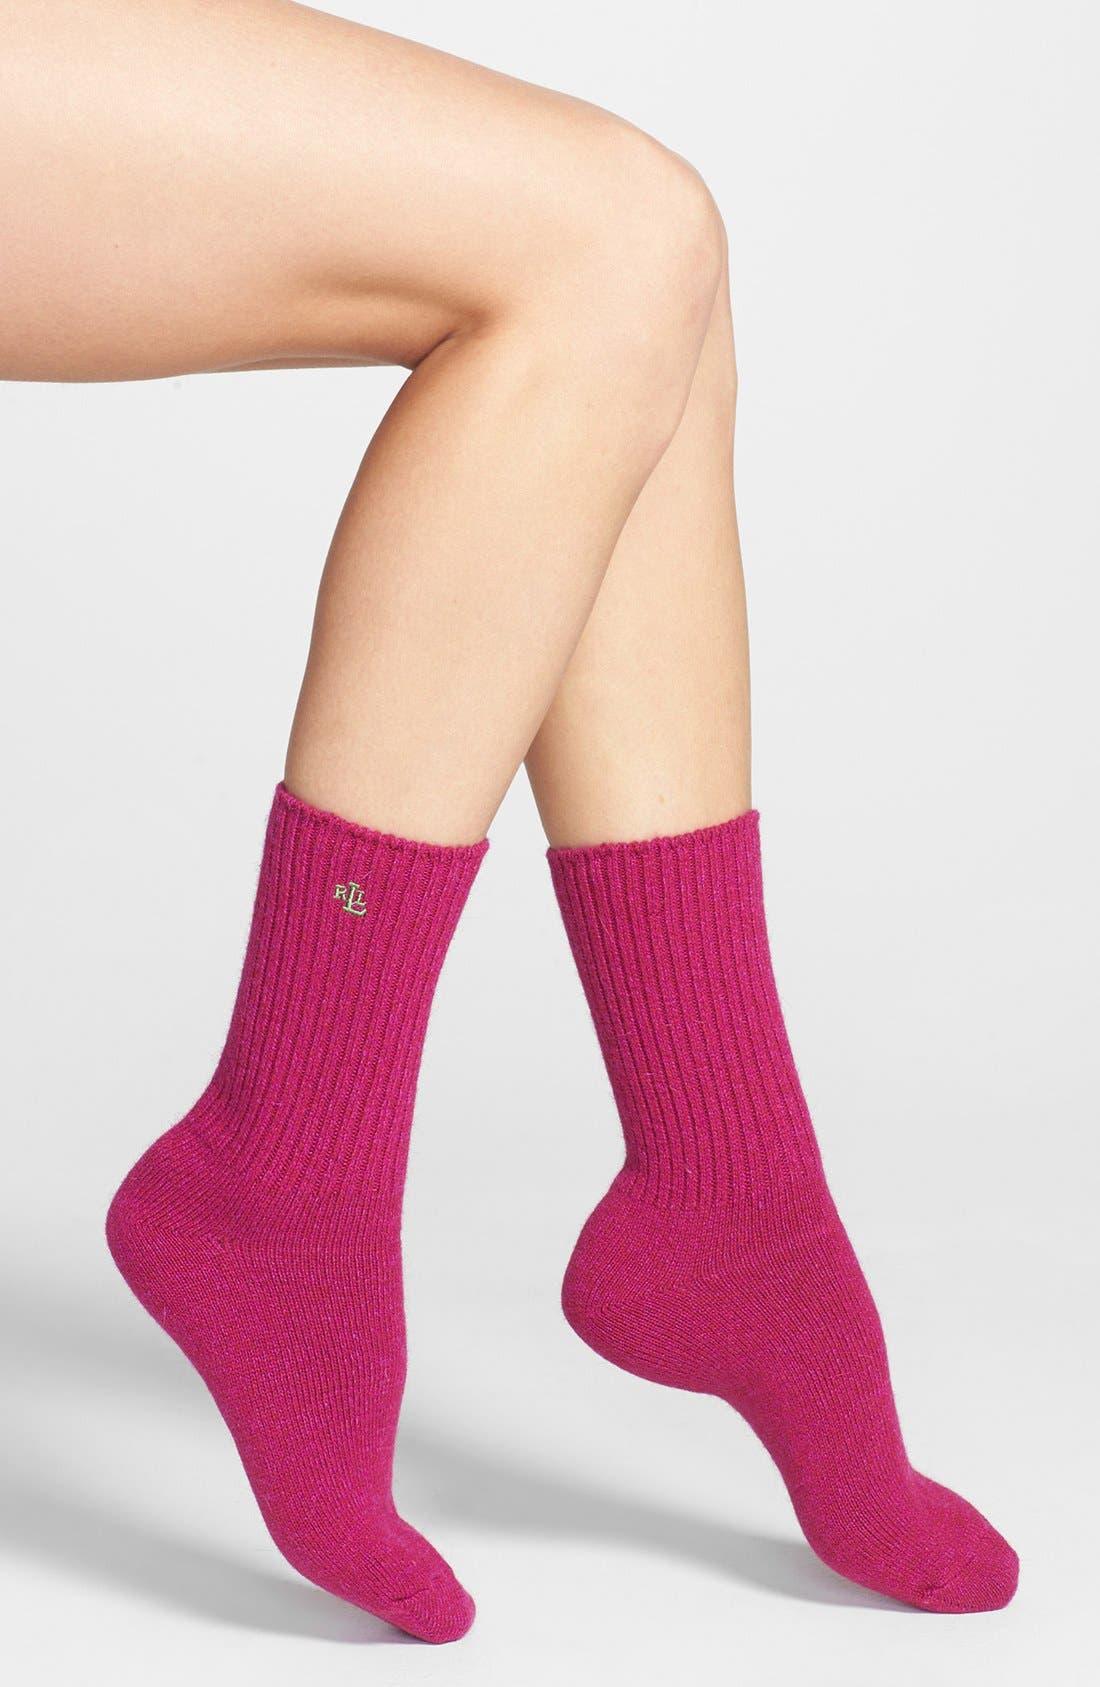 Alternate Image 1 Selected - Ralph Lauren Twist Trouser Socks